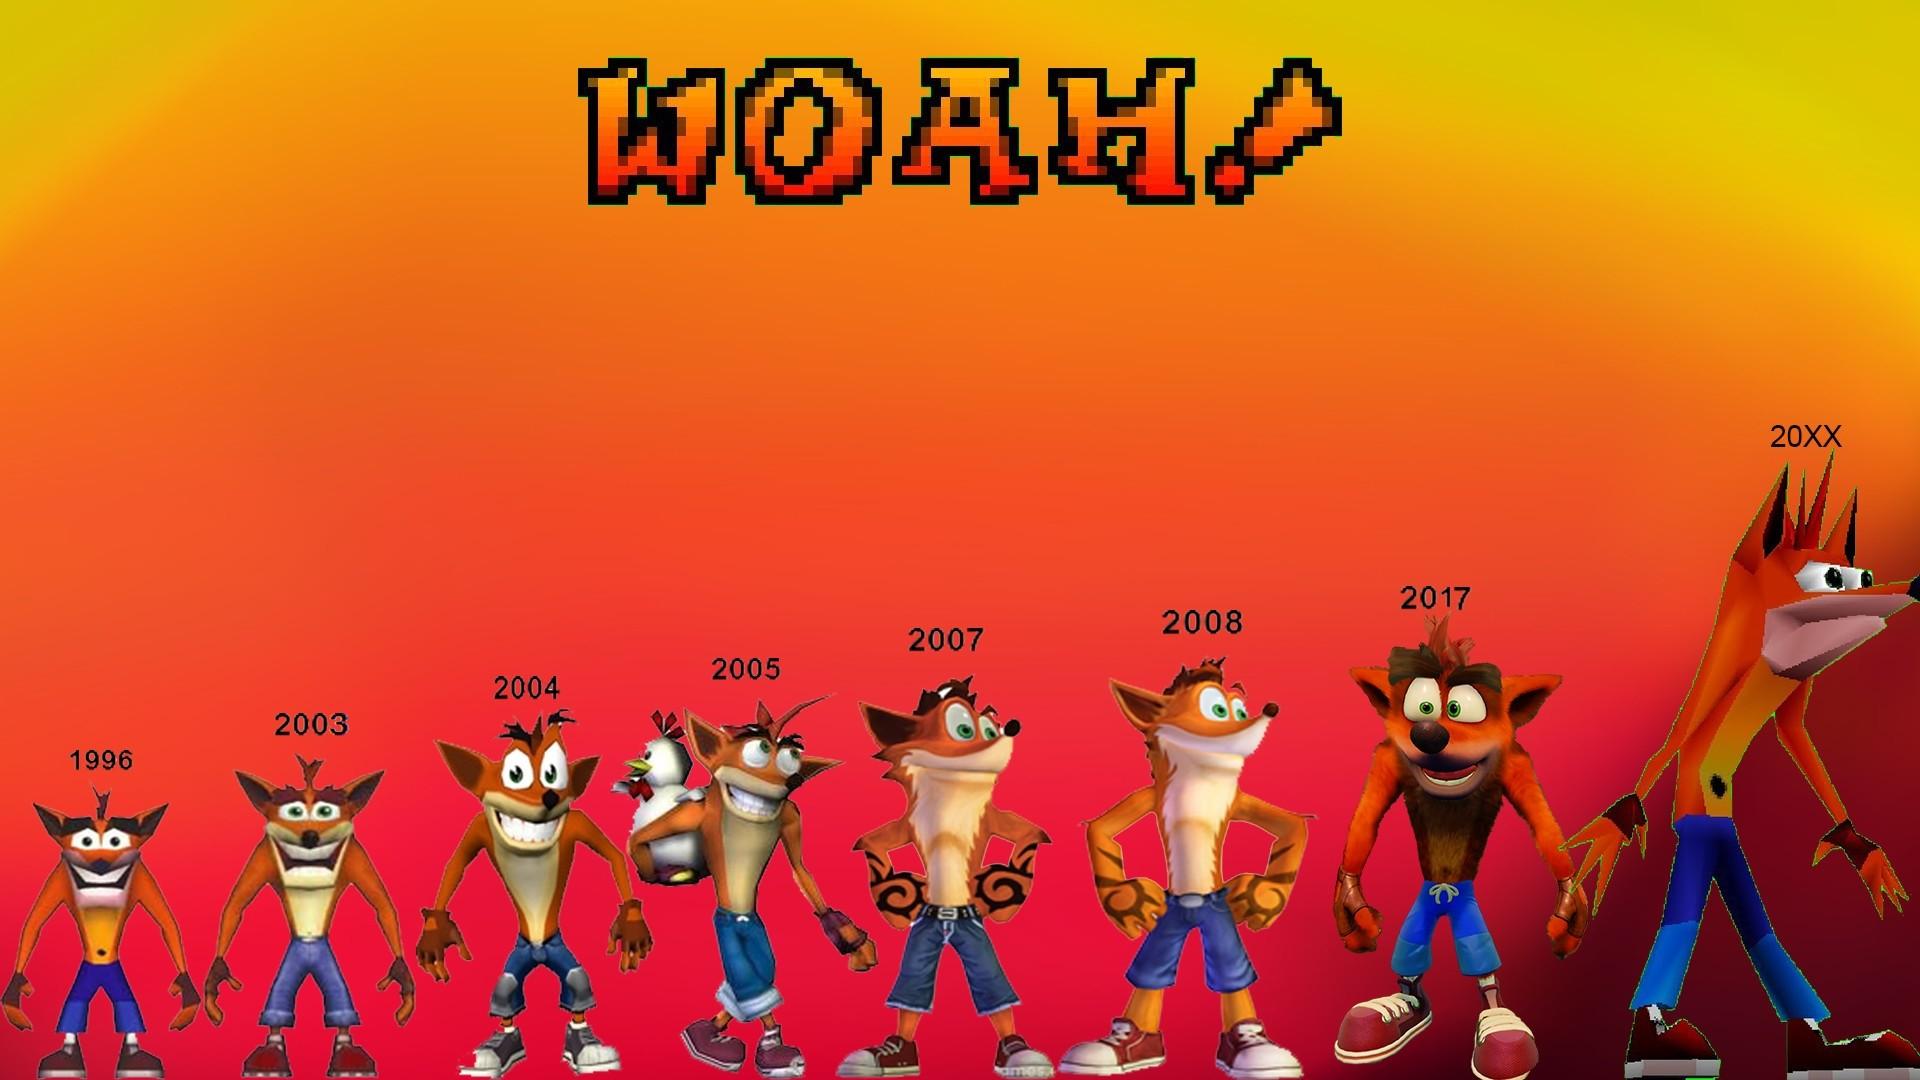 Crash Bandicoot Image